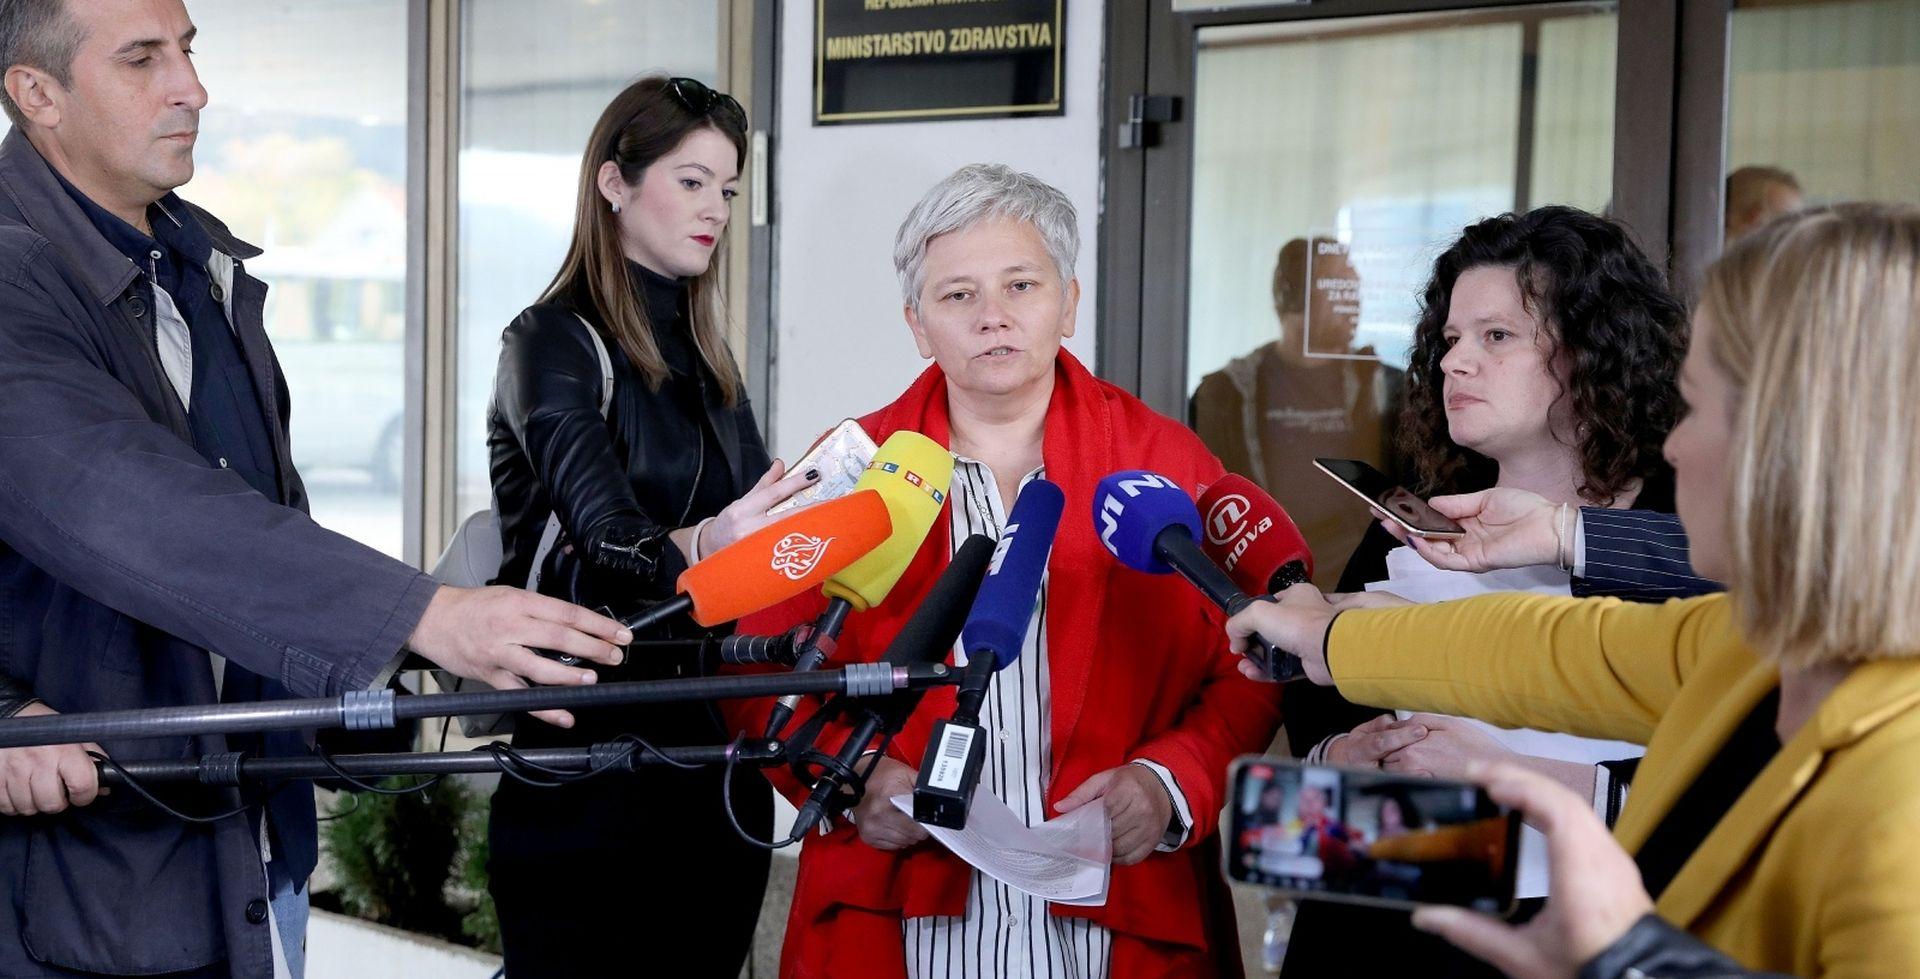 Udruga RODA predala 400 horor priča iz bolnica Ministarstvu zdravstva